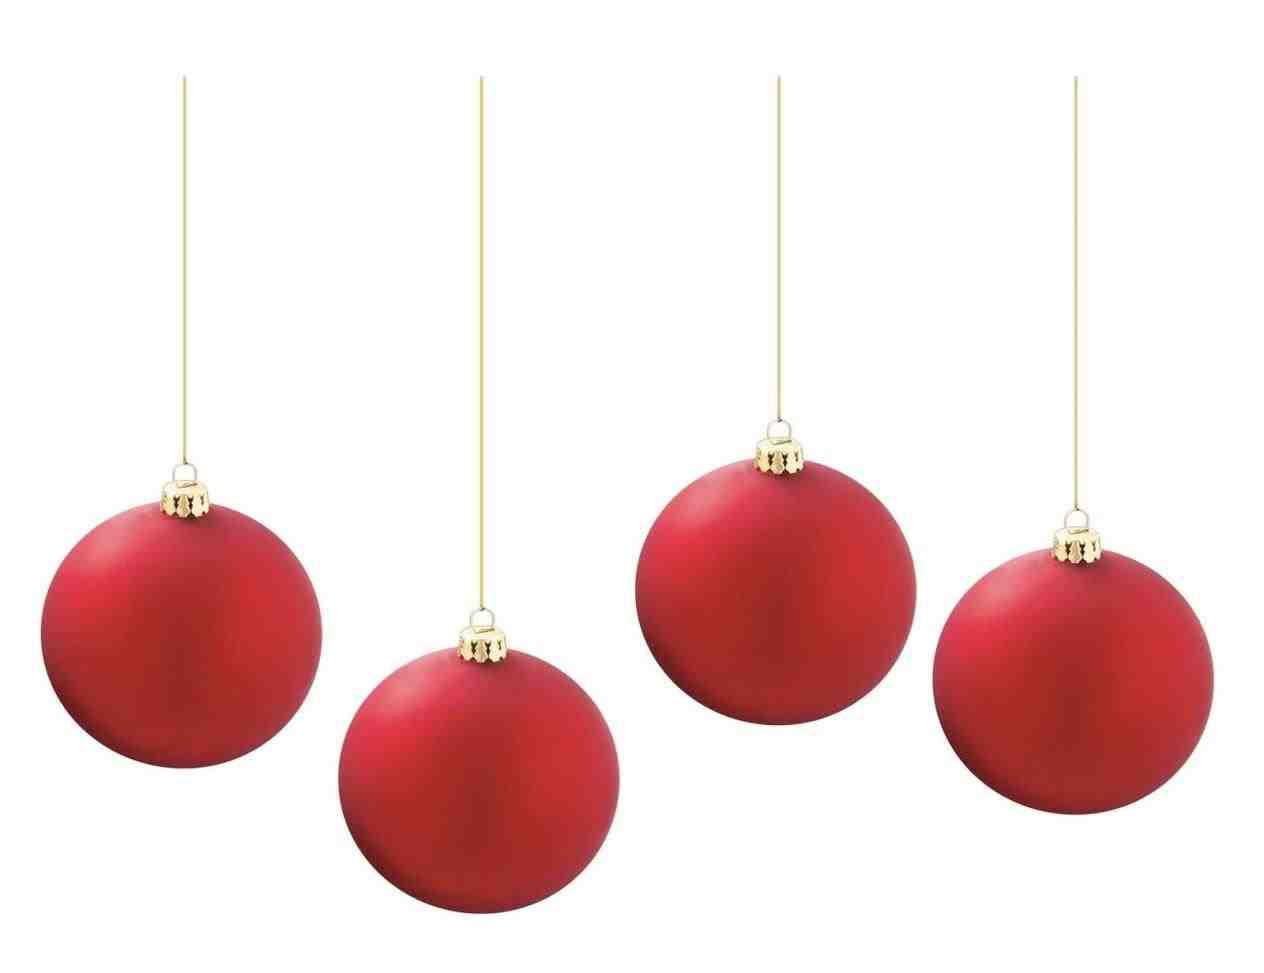 1264x973 Clip Art Ball U Download Ball Red Christmas Ornaments Clipart Clip